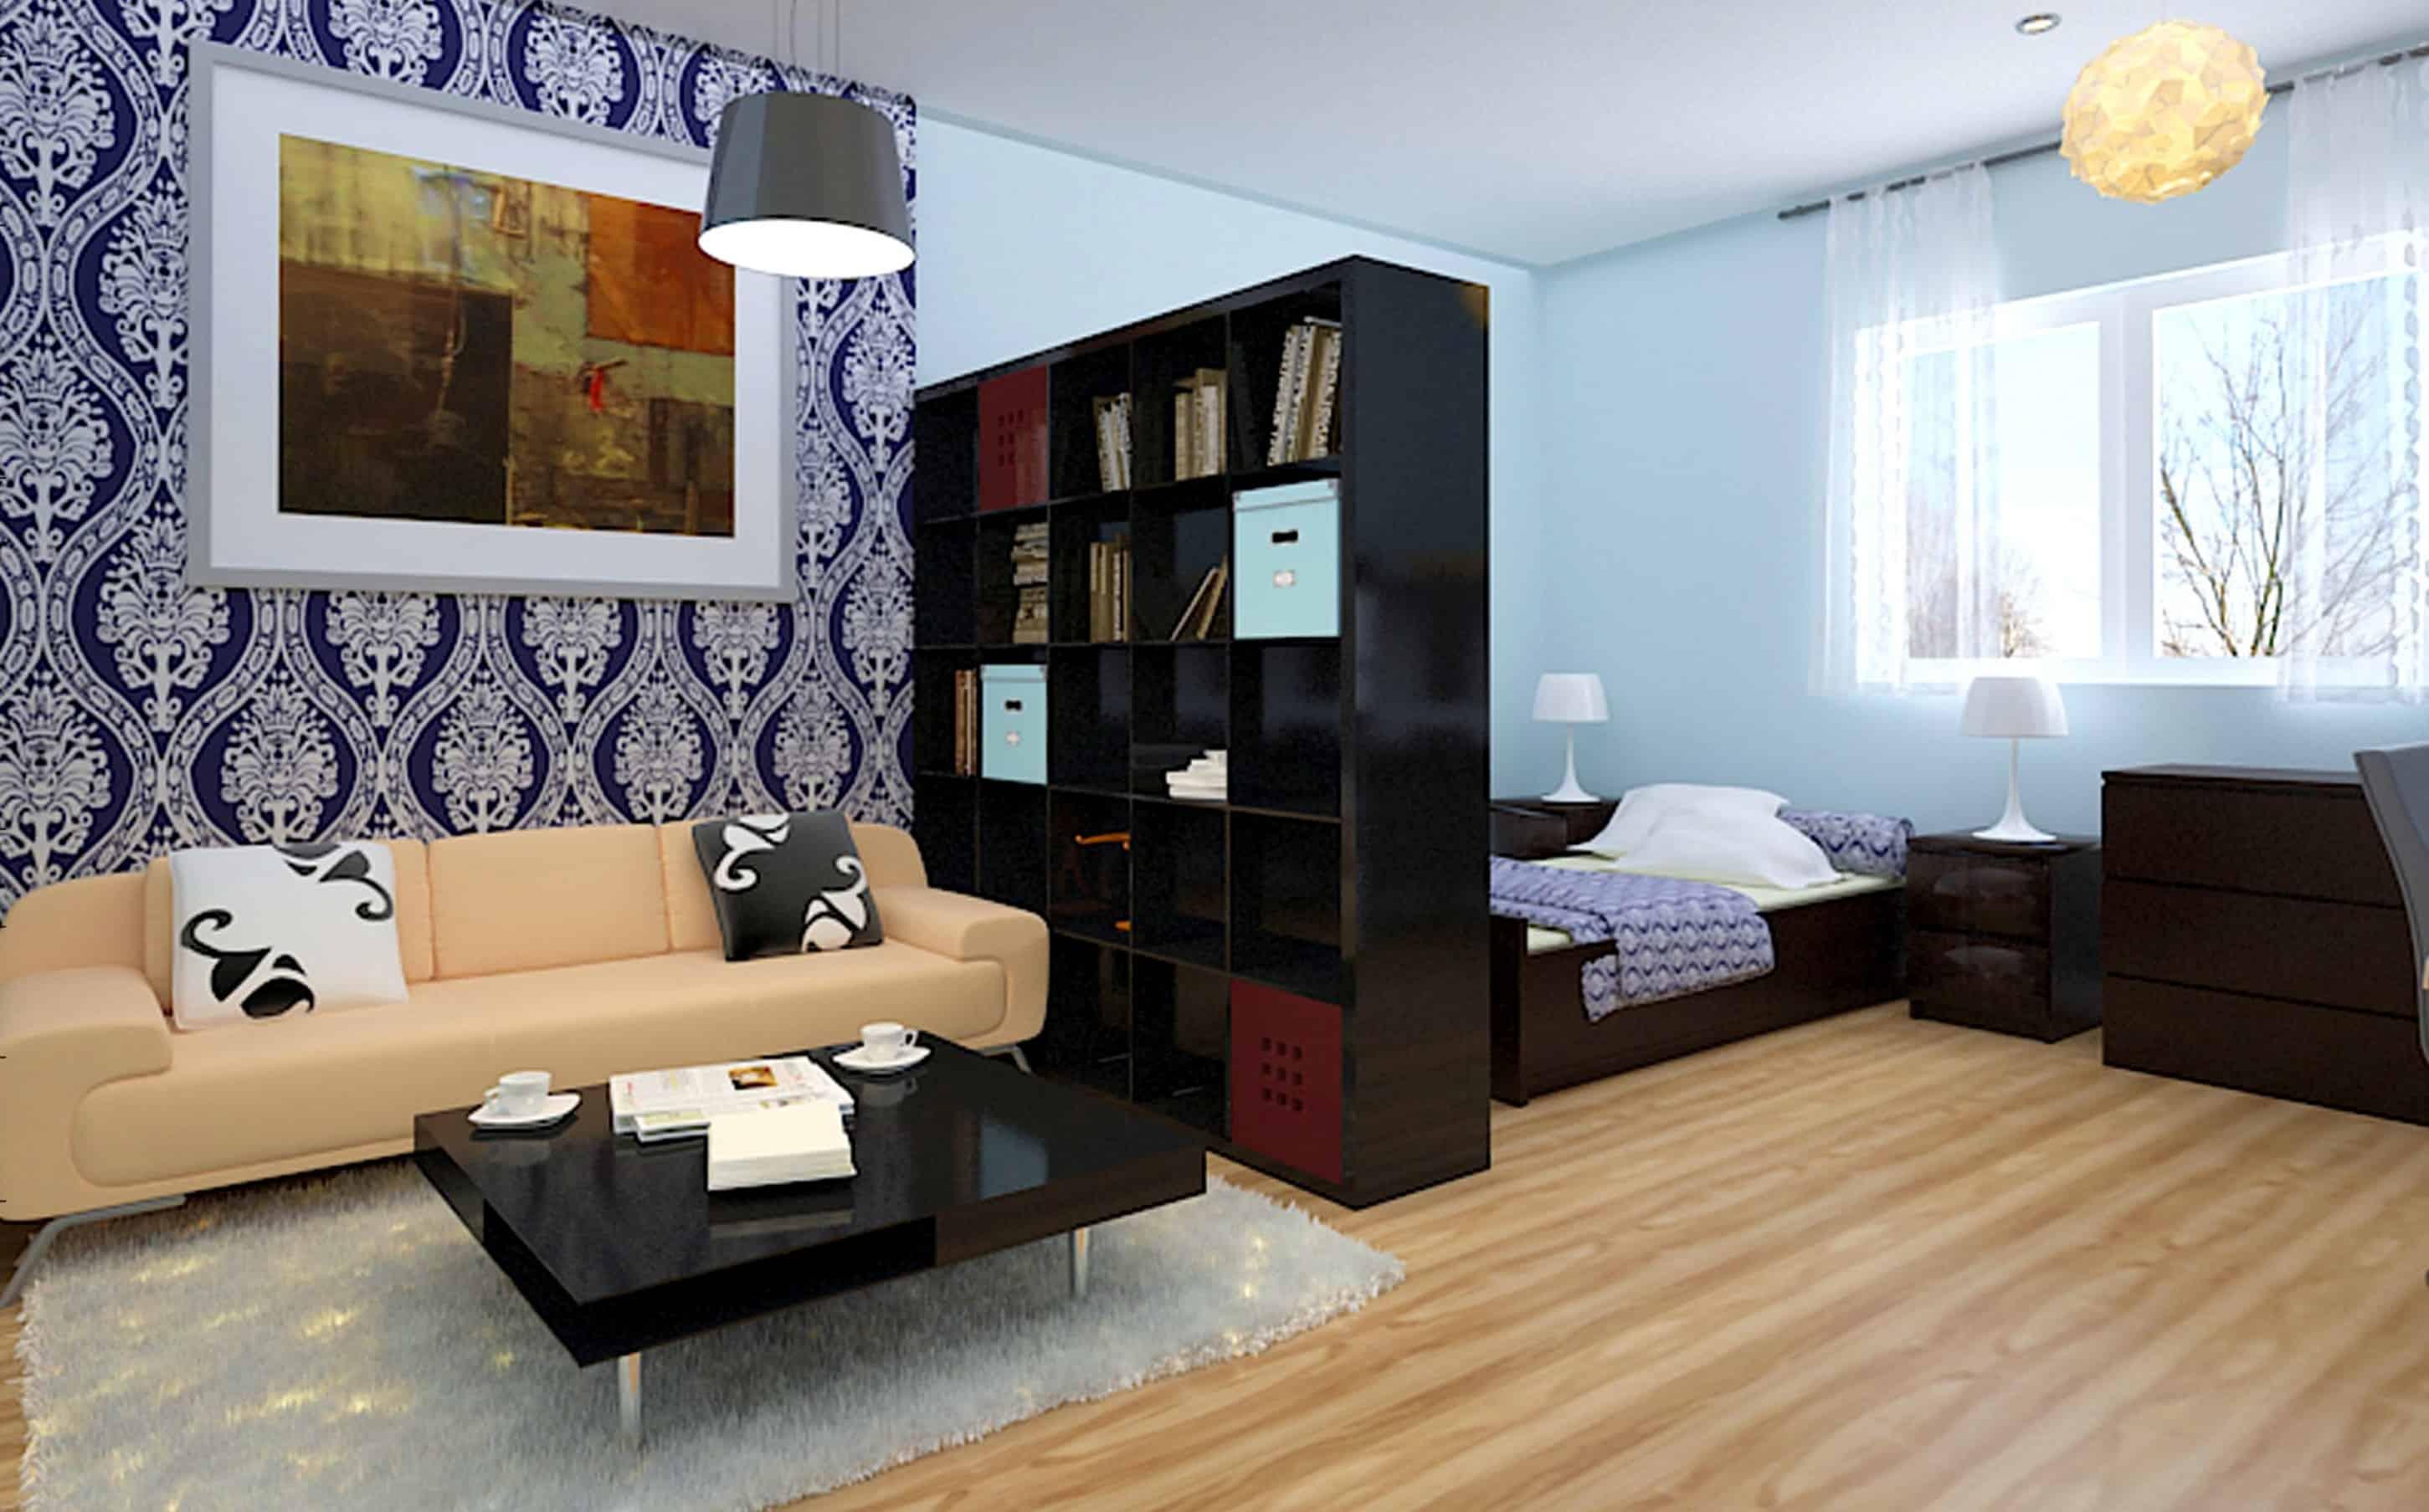 Apartments.com Apartment Finding App